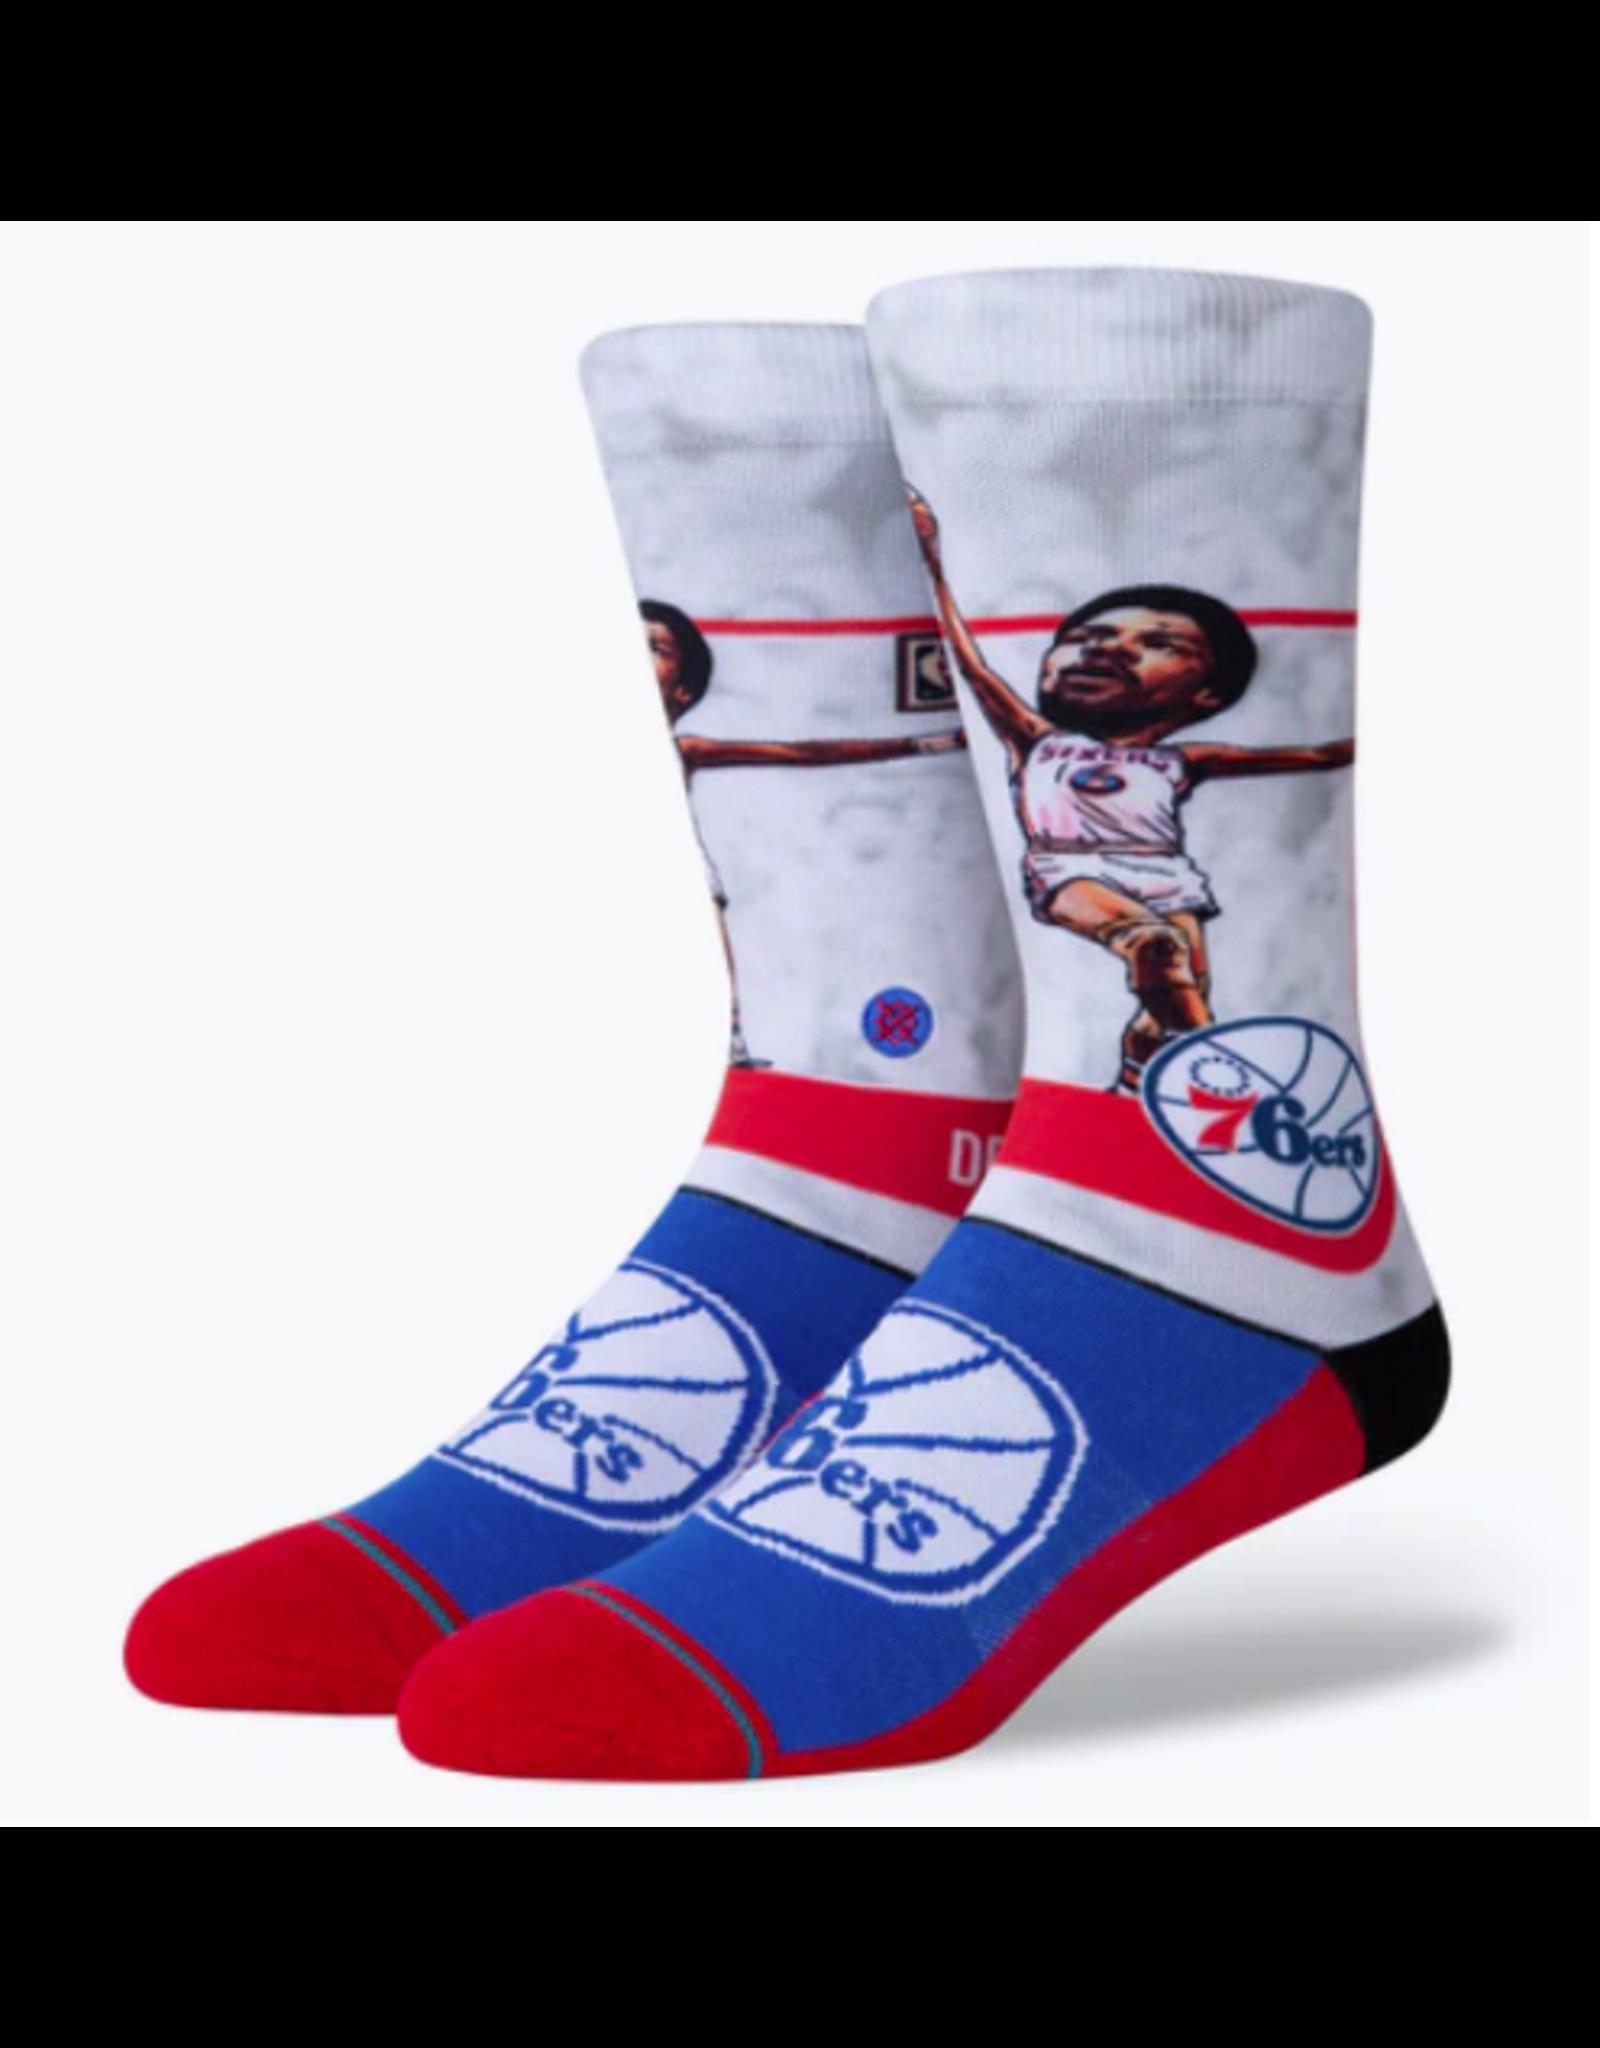 Stance NBA Dr J Big Head - Red